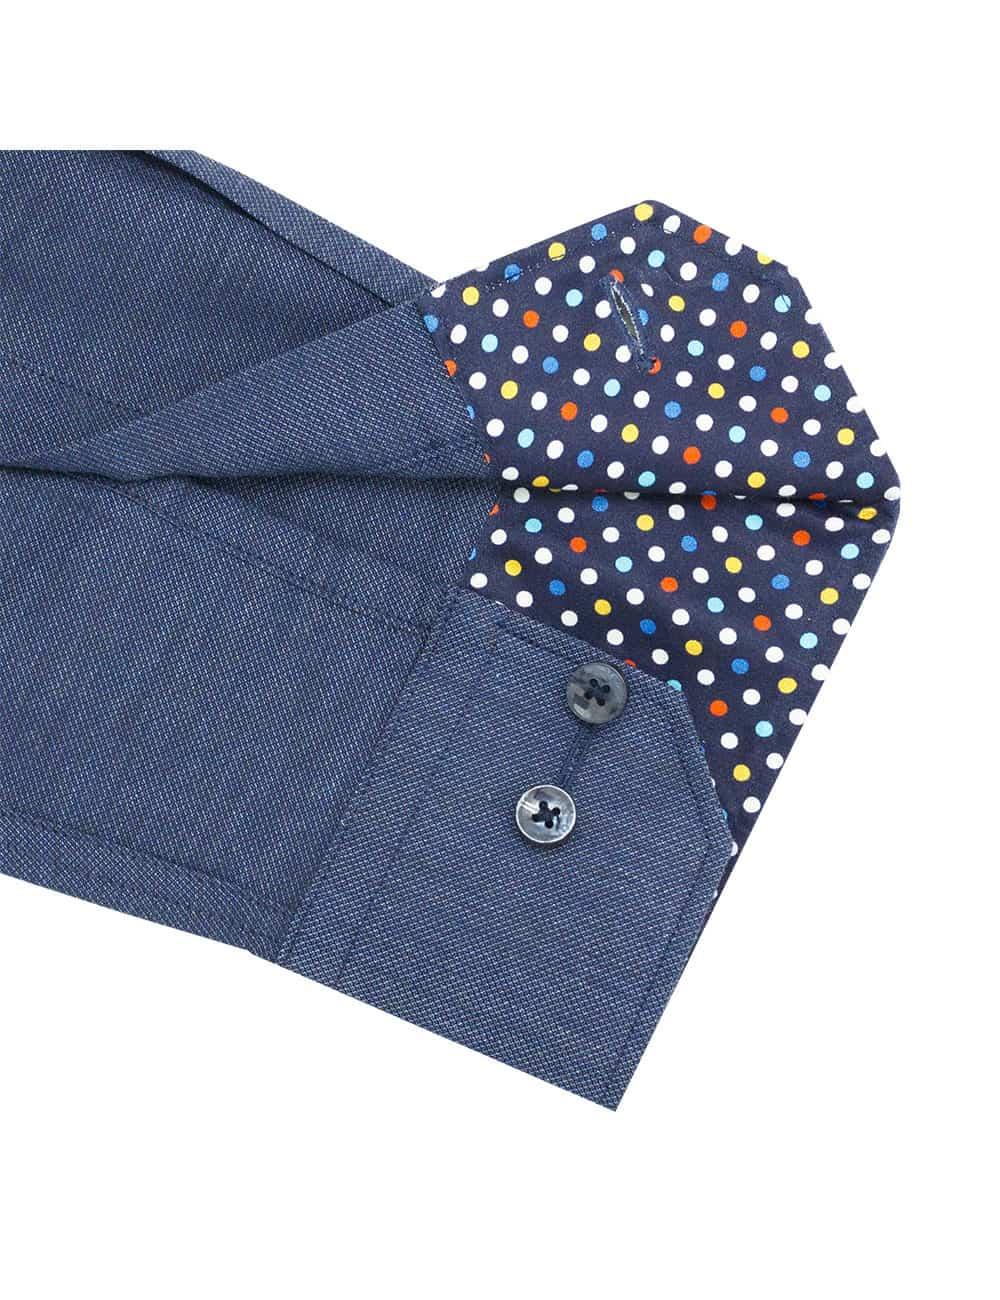 CF Blue Heather Easy Iron 100% Cotton Long Sleeve Single Cuff Shirt CF2A28.15